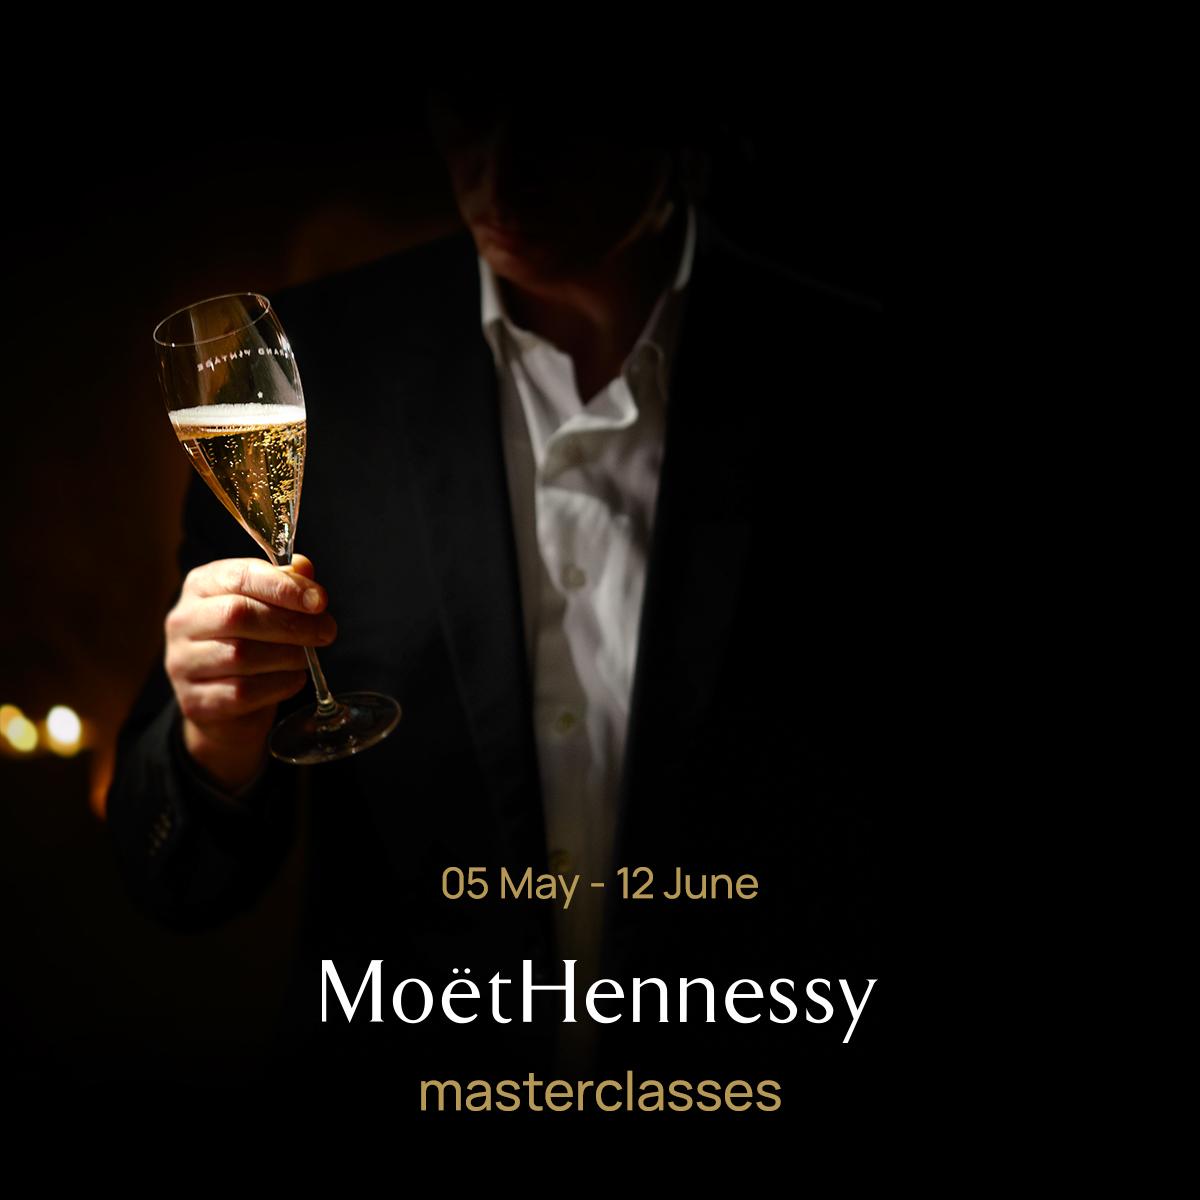 Amvyx Moet Hennessy Masterclasses